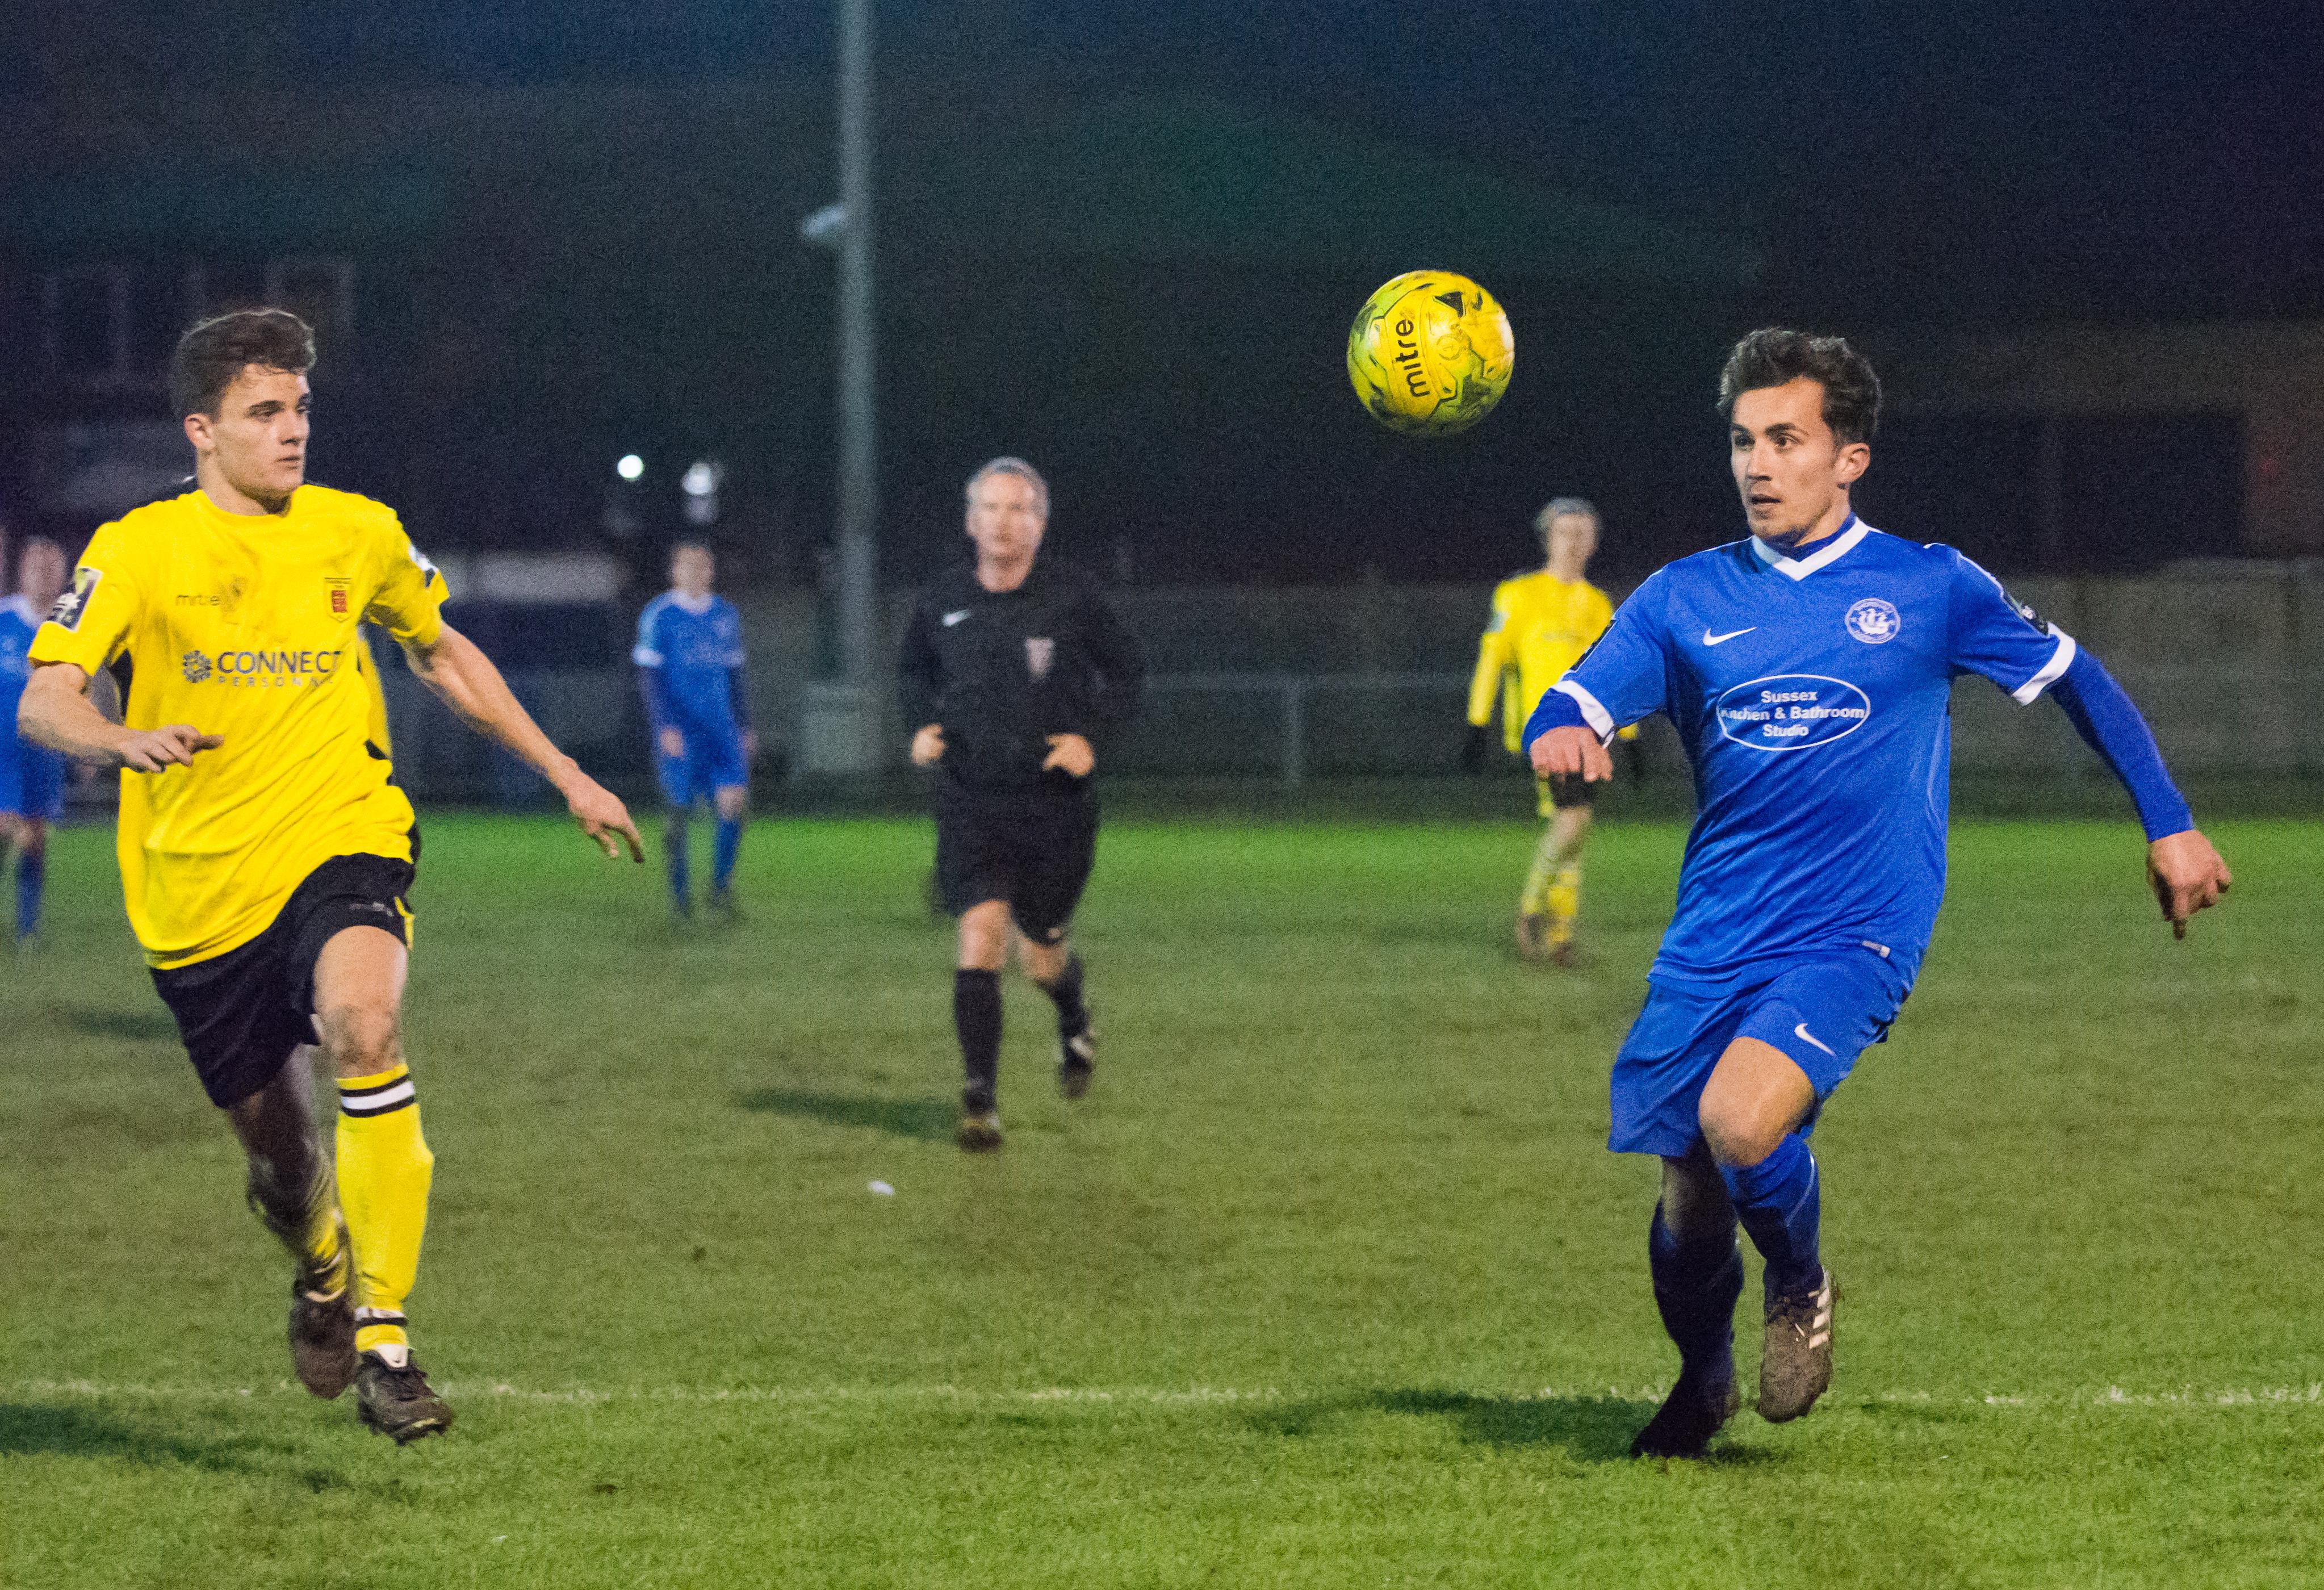 Shoreham FC vs Faversham Town 16.12.17 58